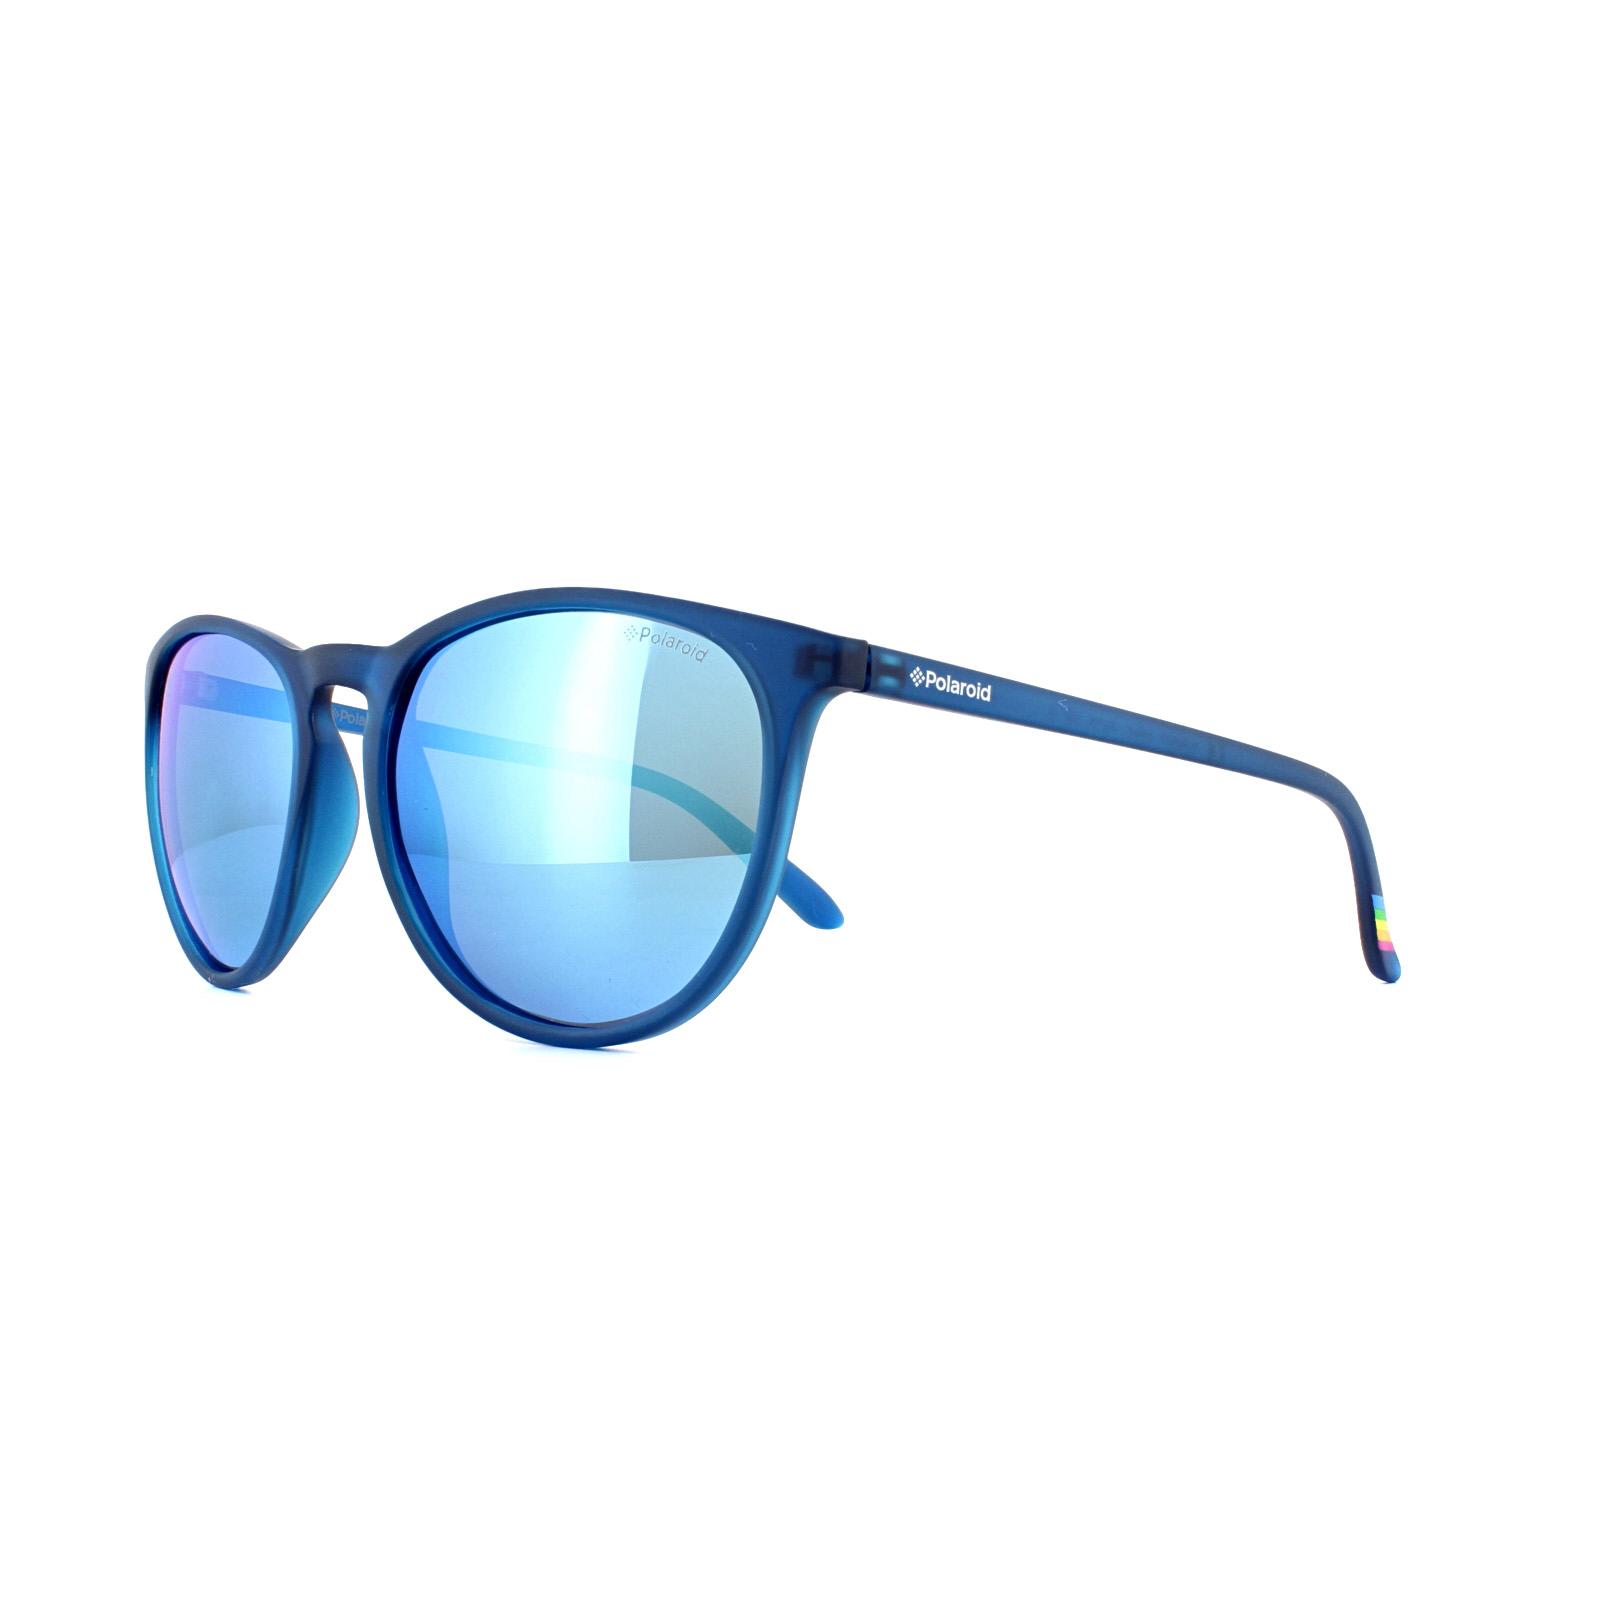 47dacaa1e8b Sentinel Polaroid Sunglasses PLD 6003 N UJO JY Blue Blue Mirror Polarized